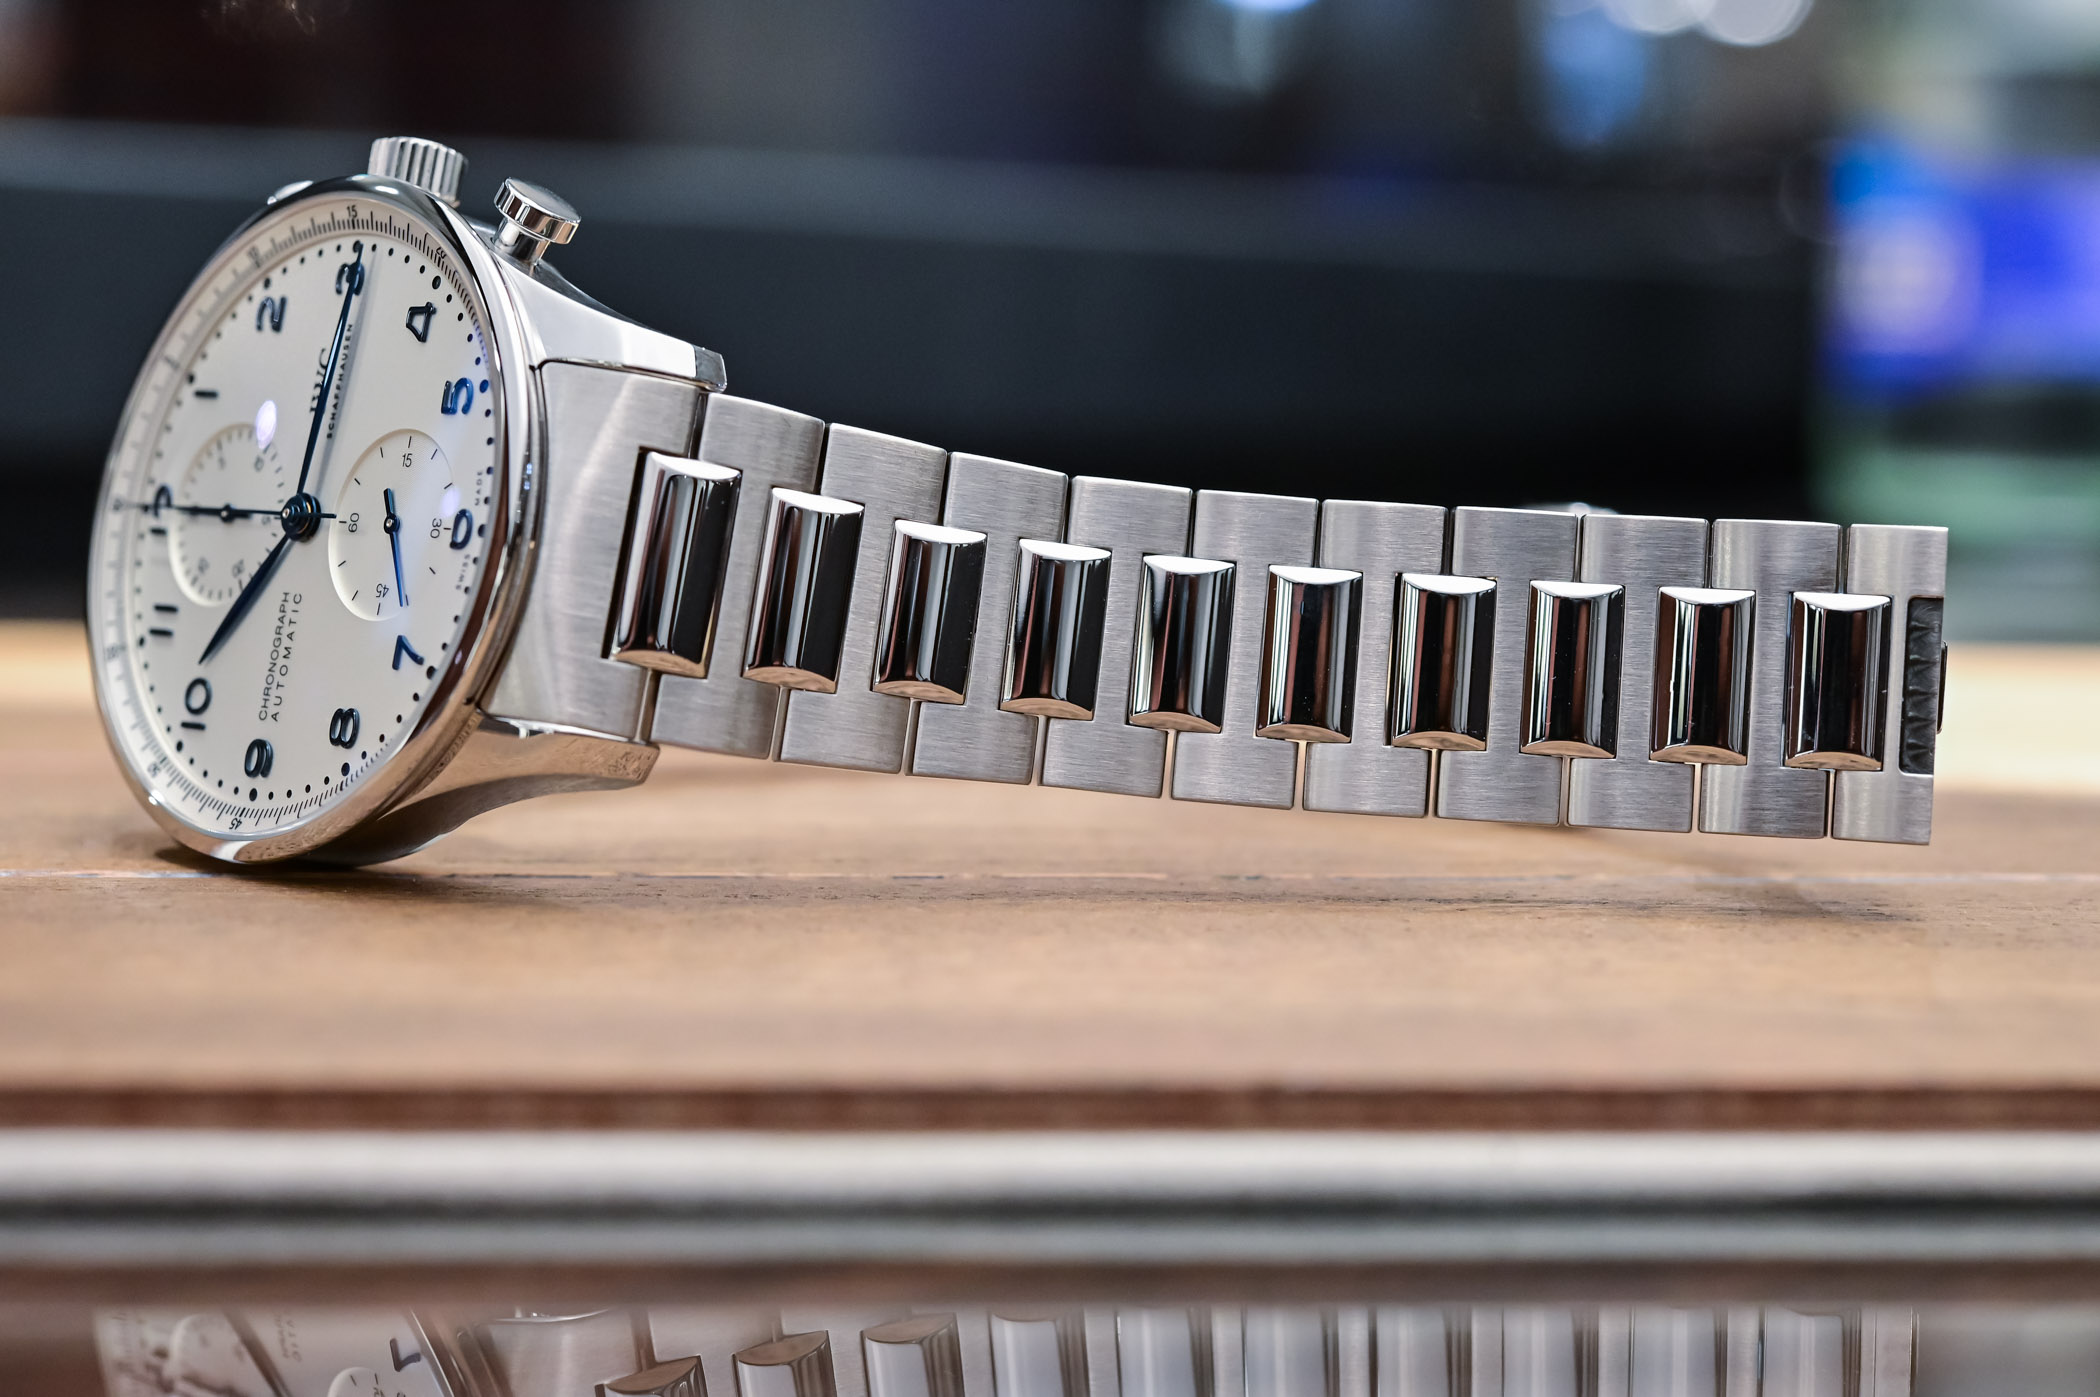 IWC Portugieser Chronograph 3716 Steel Bracelet IW371617 - 6